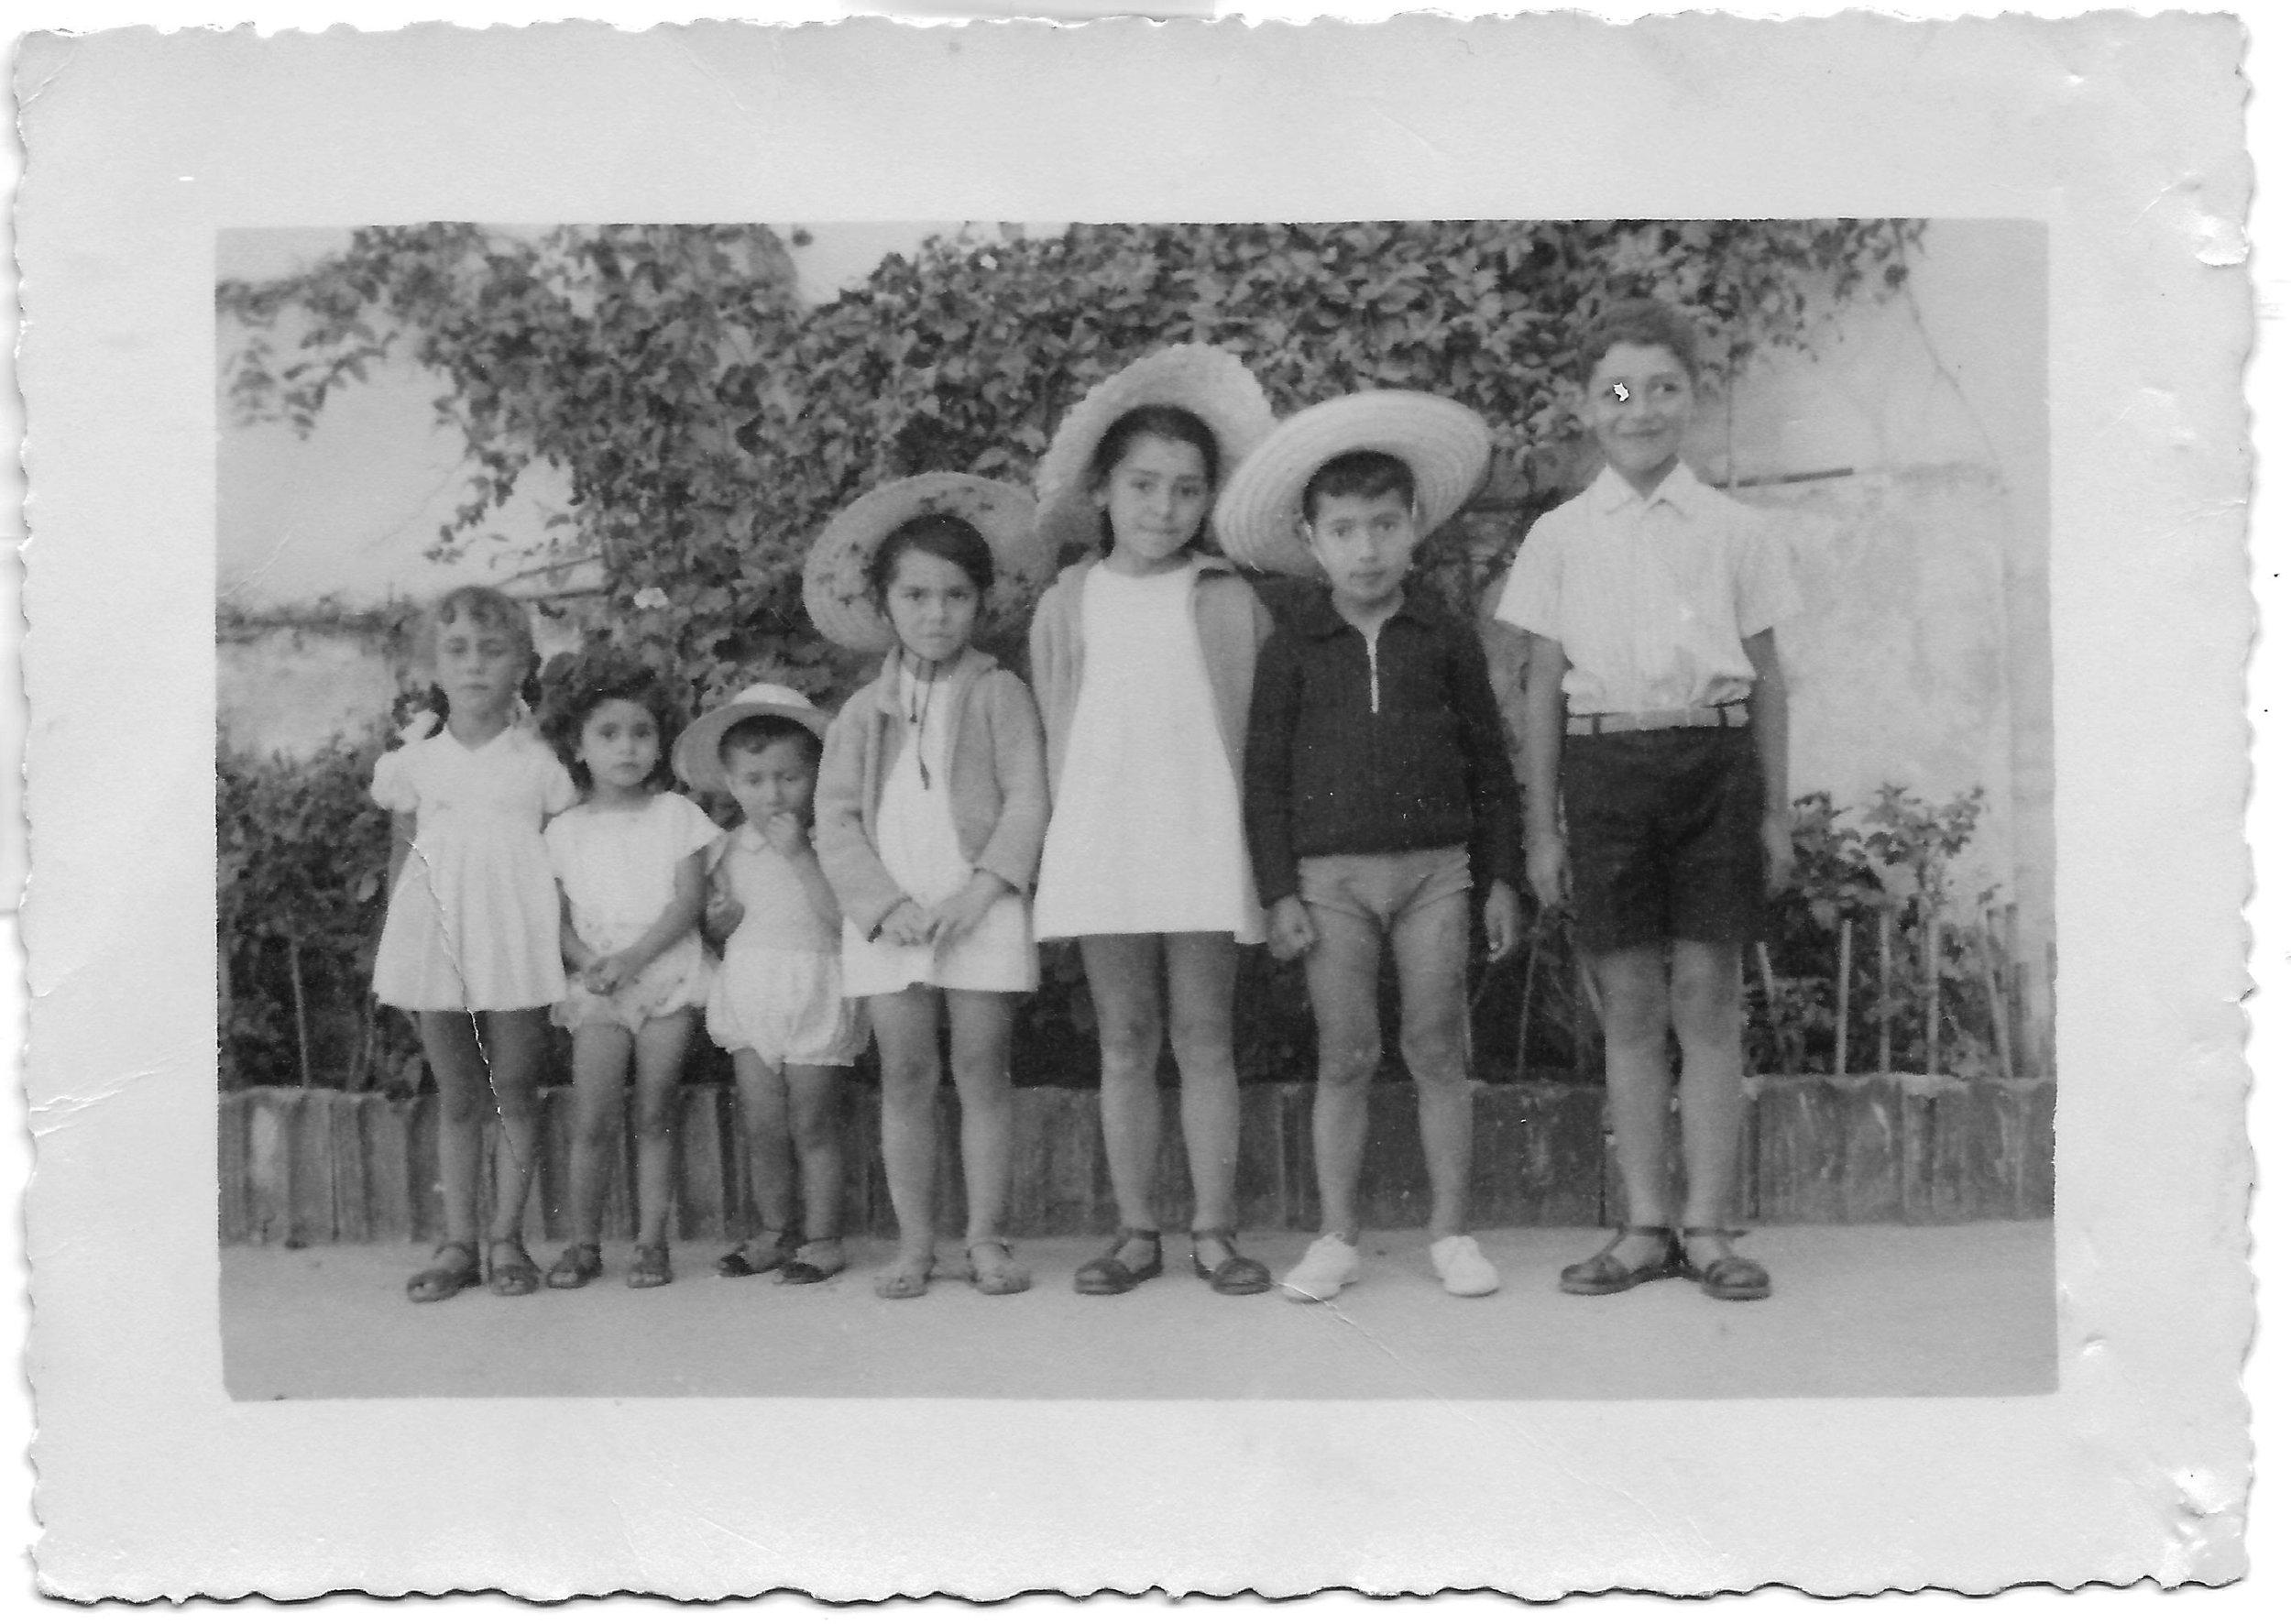 Yvonne Krakowiak between two refugee children (left) and four Portuguese friends, Figueira da Foz, 1941.